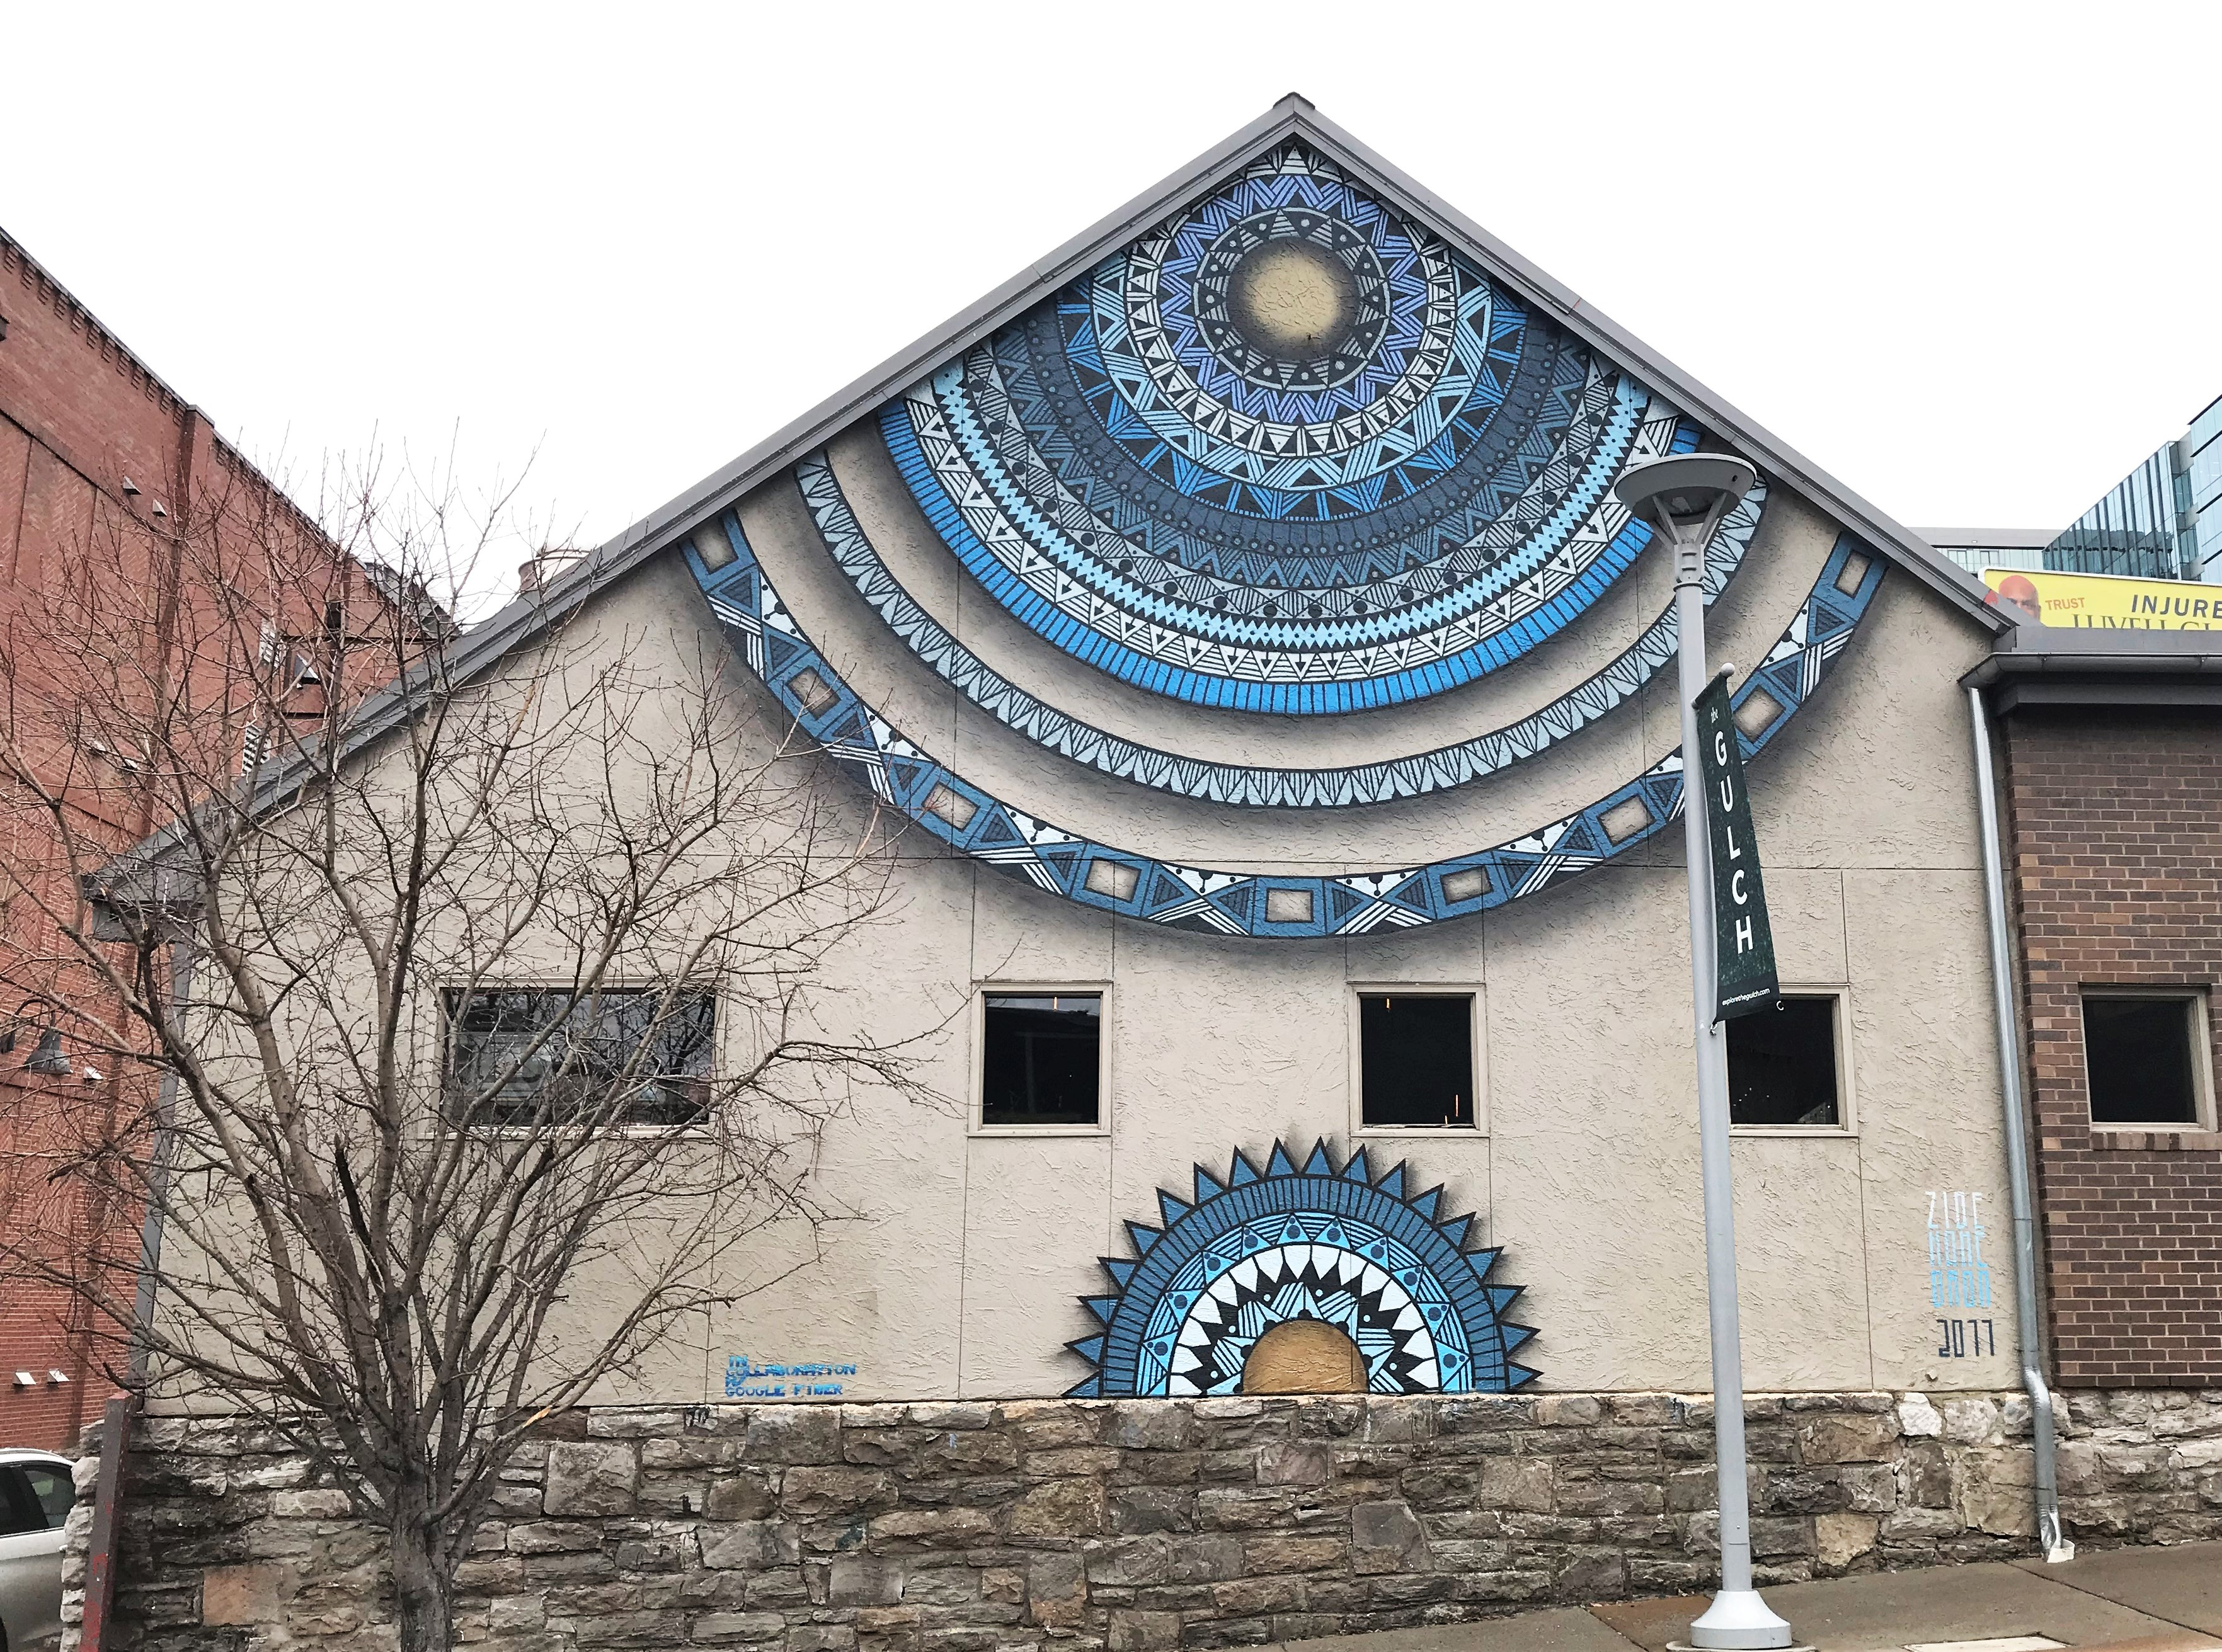 One mural down, one mural up – nashville public art